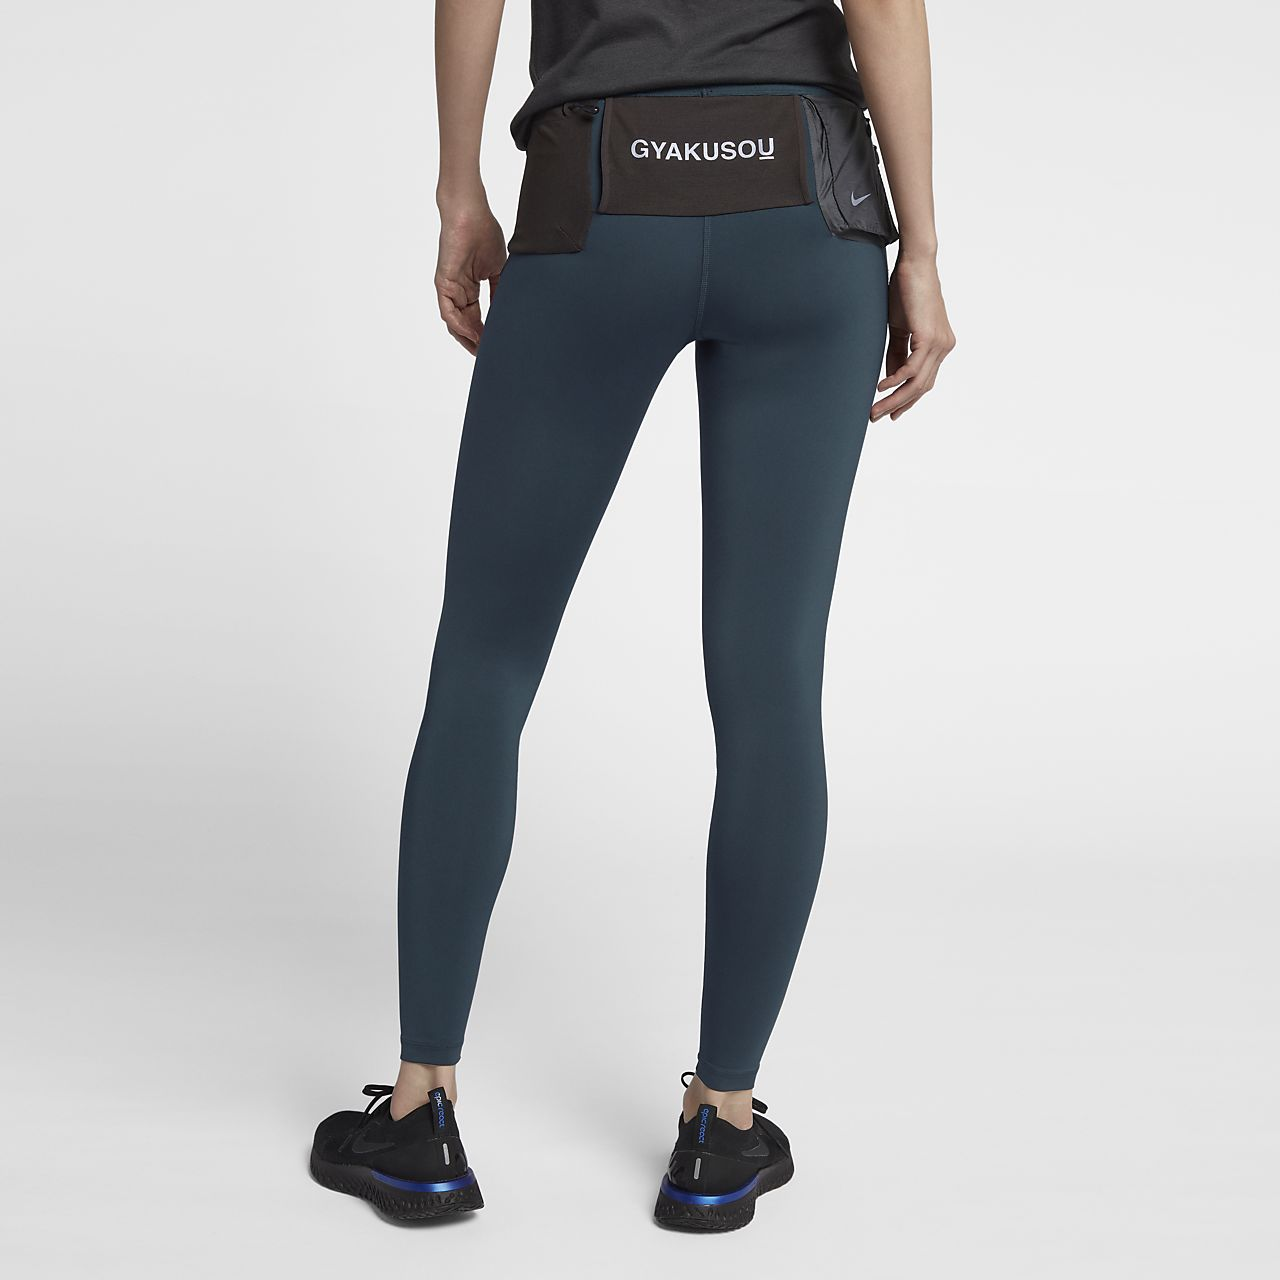 Nike Gyakusou Utility 女子紧身裤